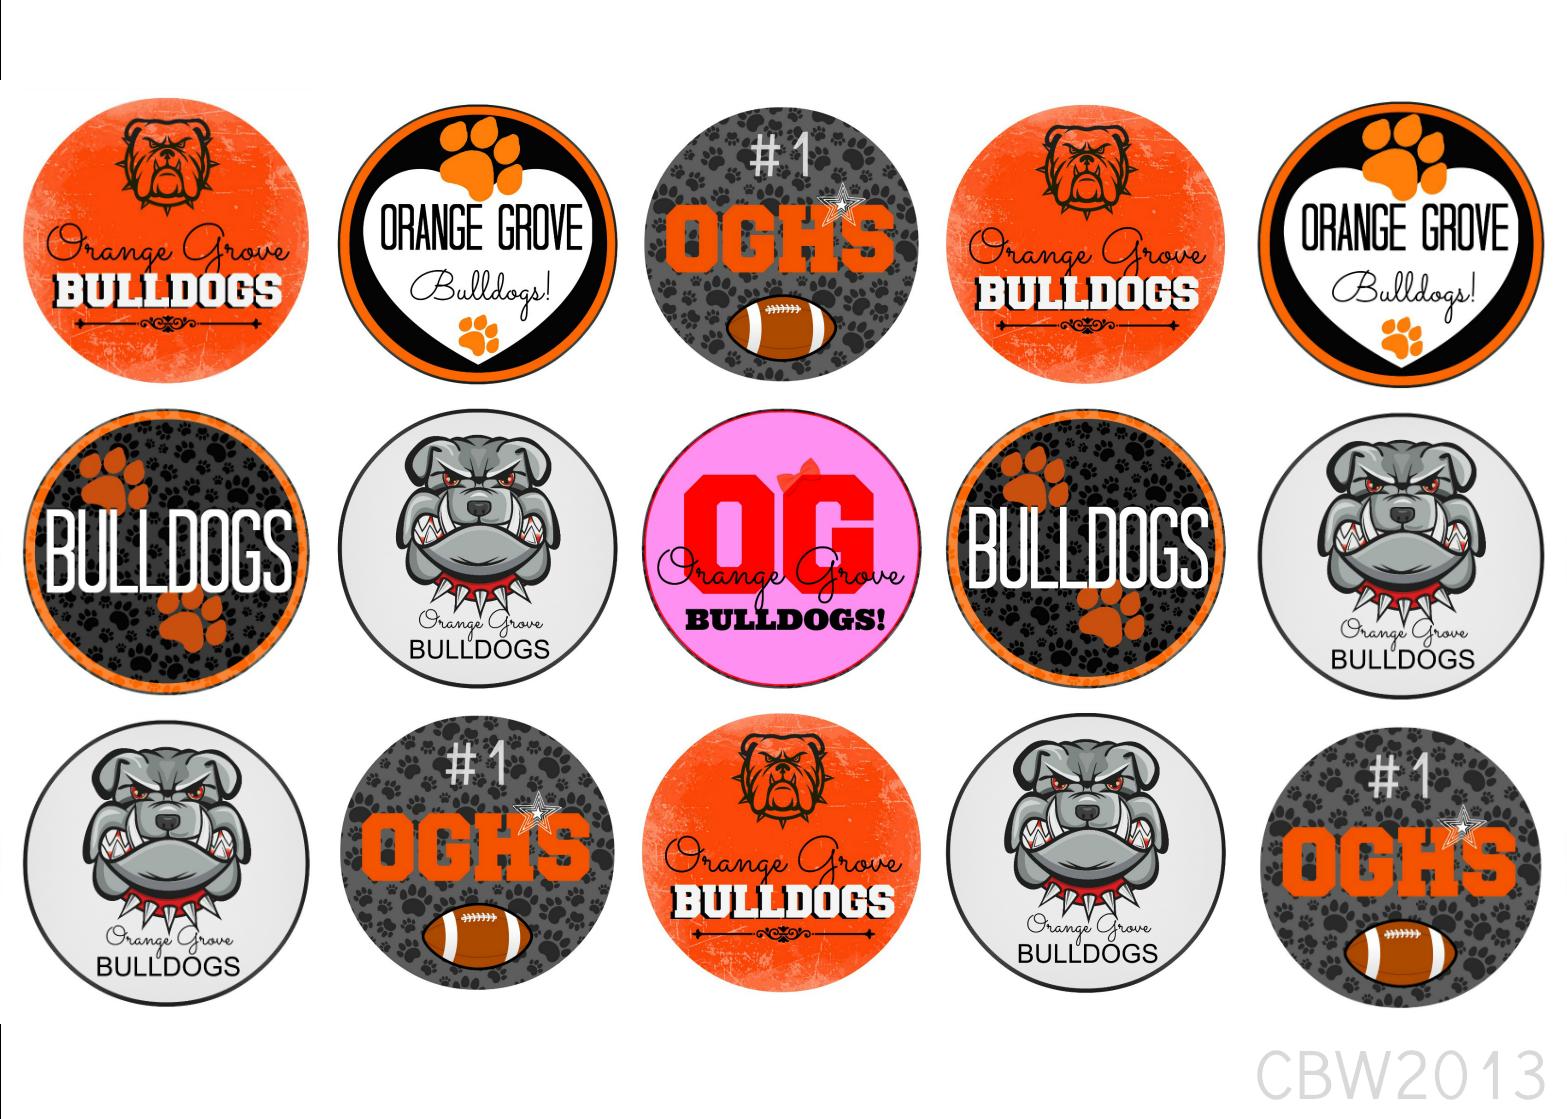 Orange Grove Bulldogs